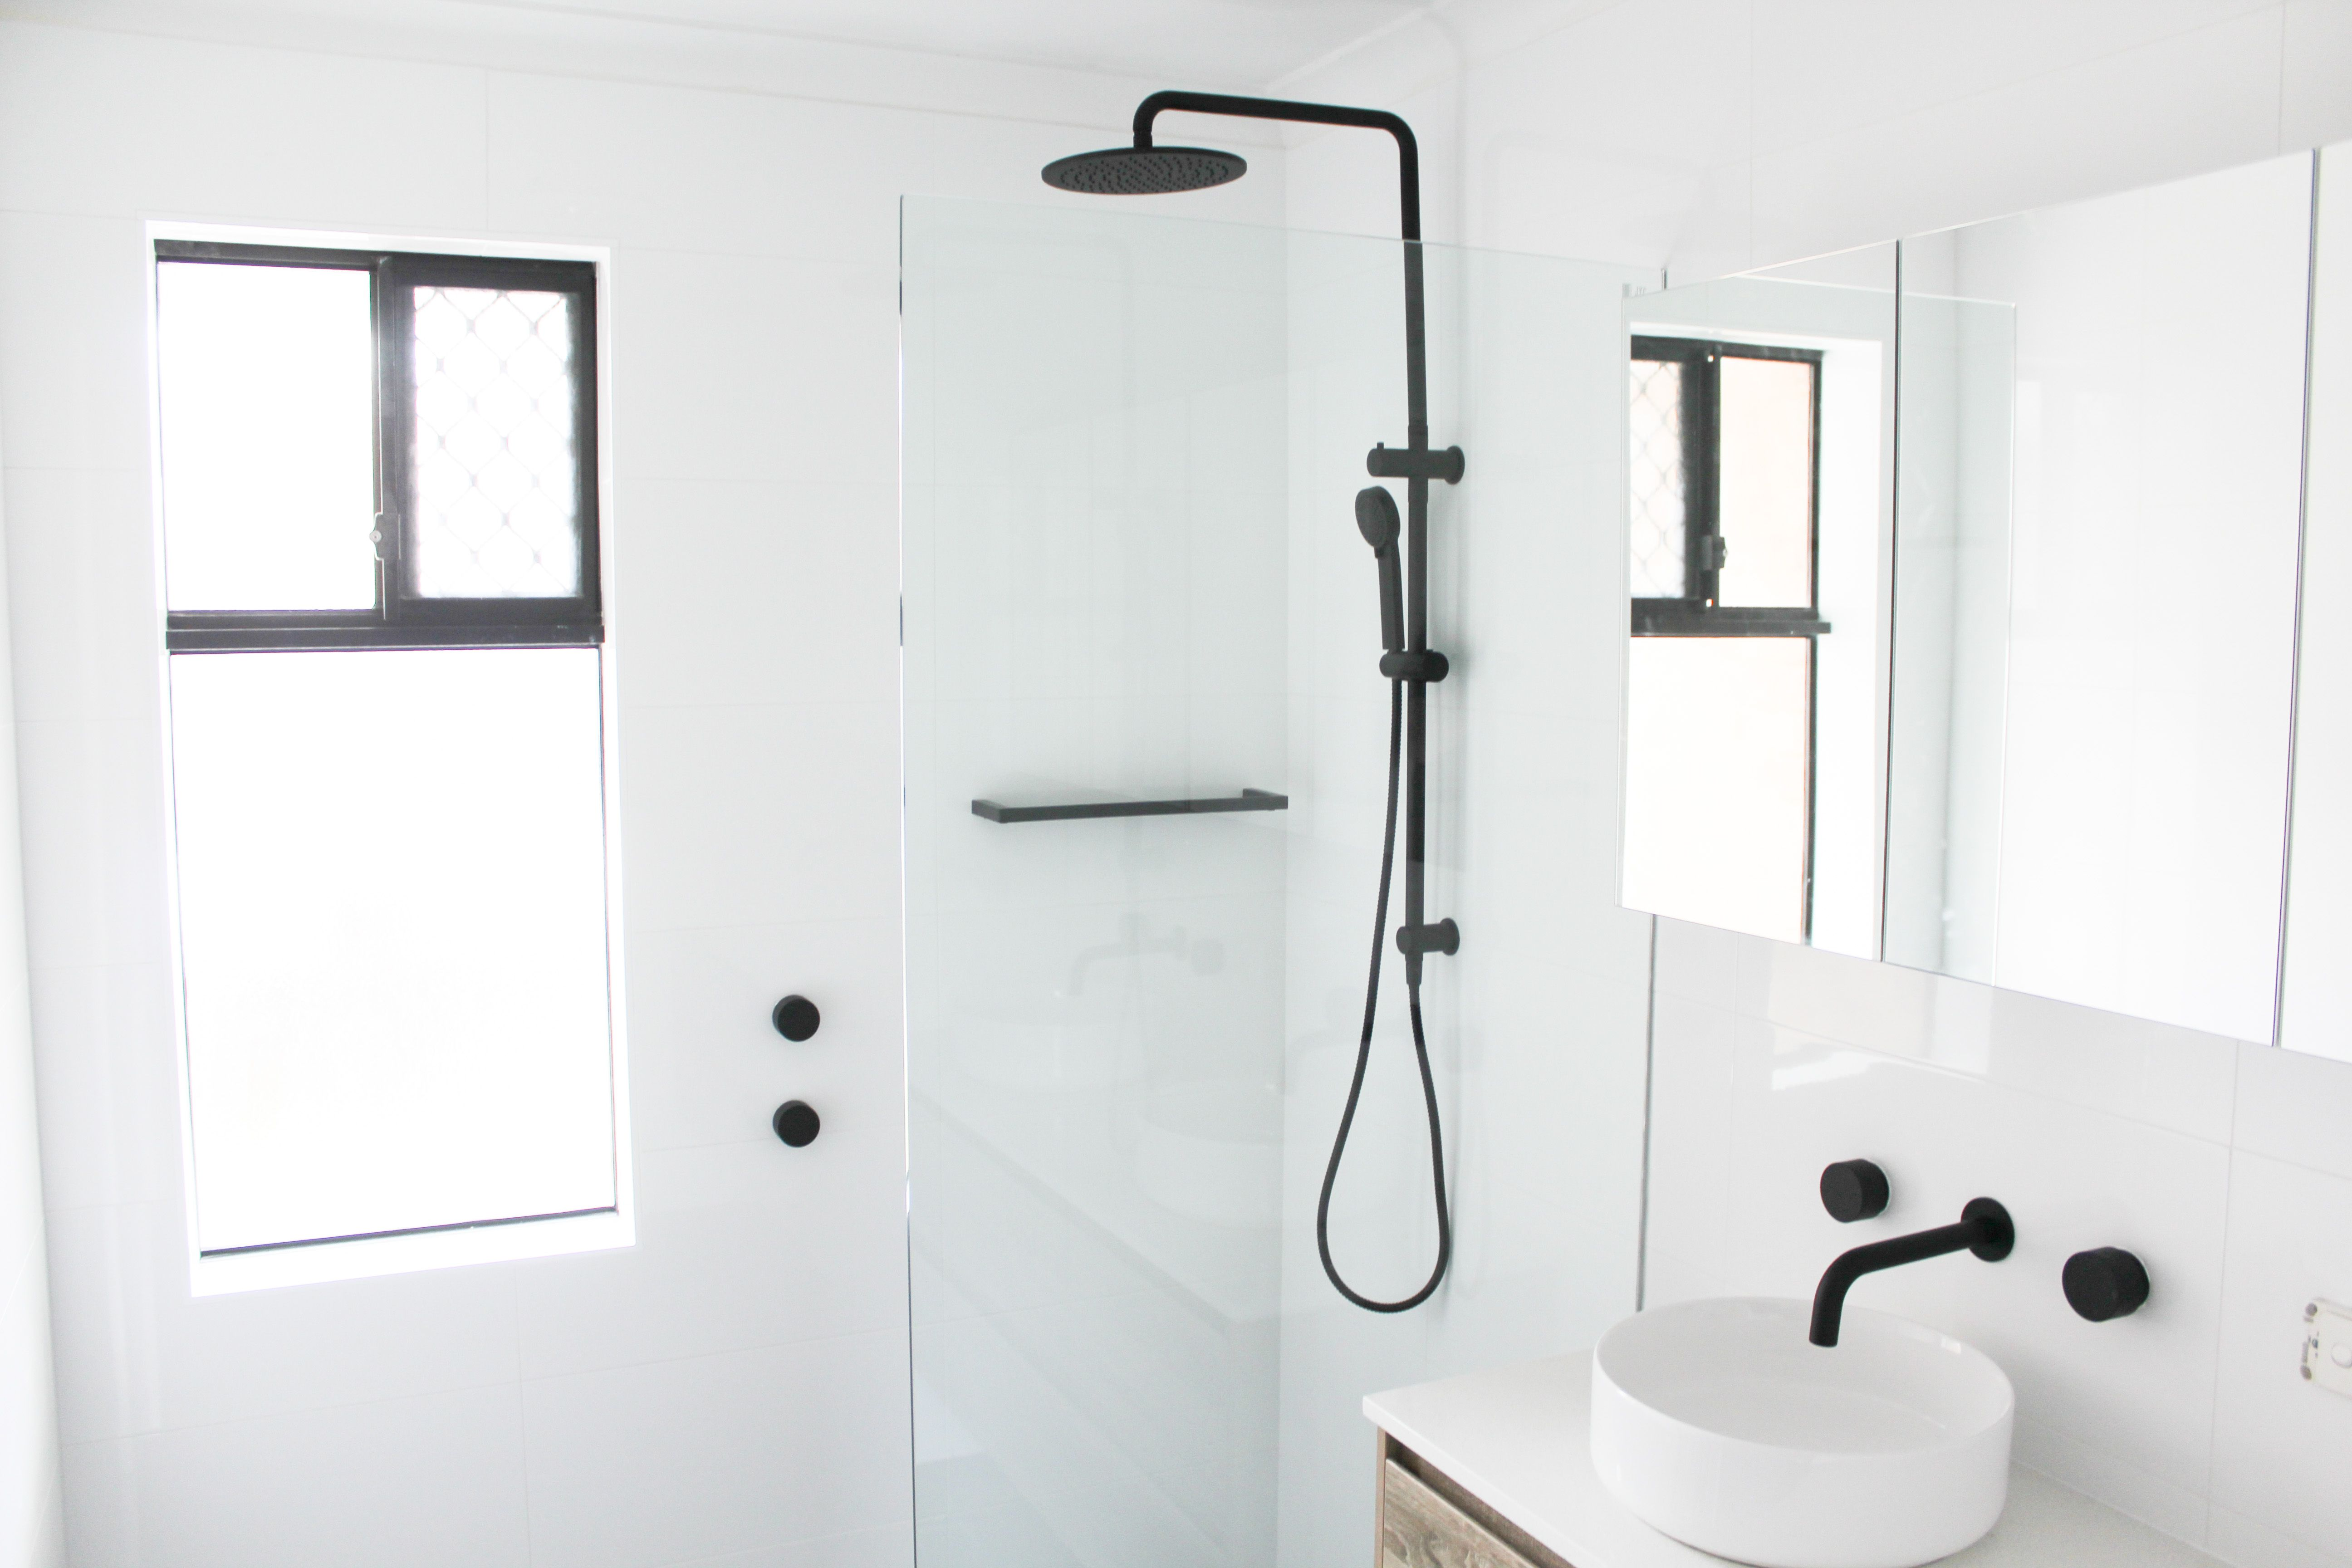 Bathrooms Black Shower Combo Taps